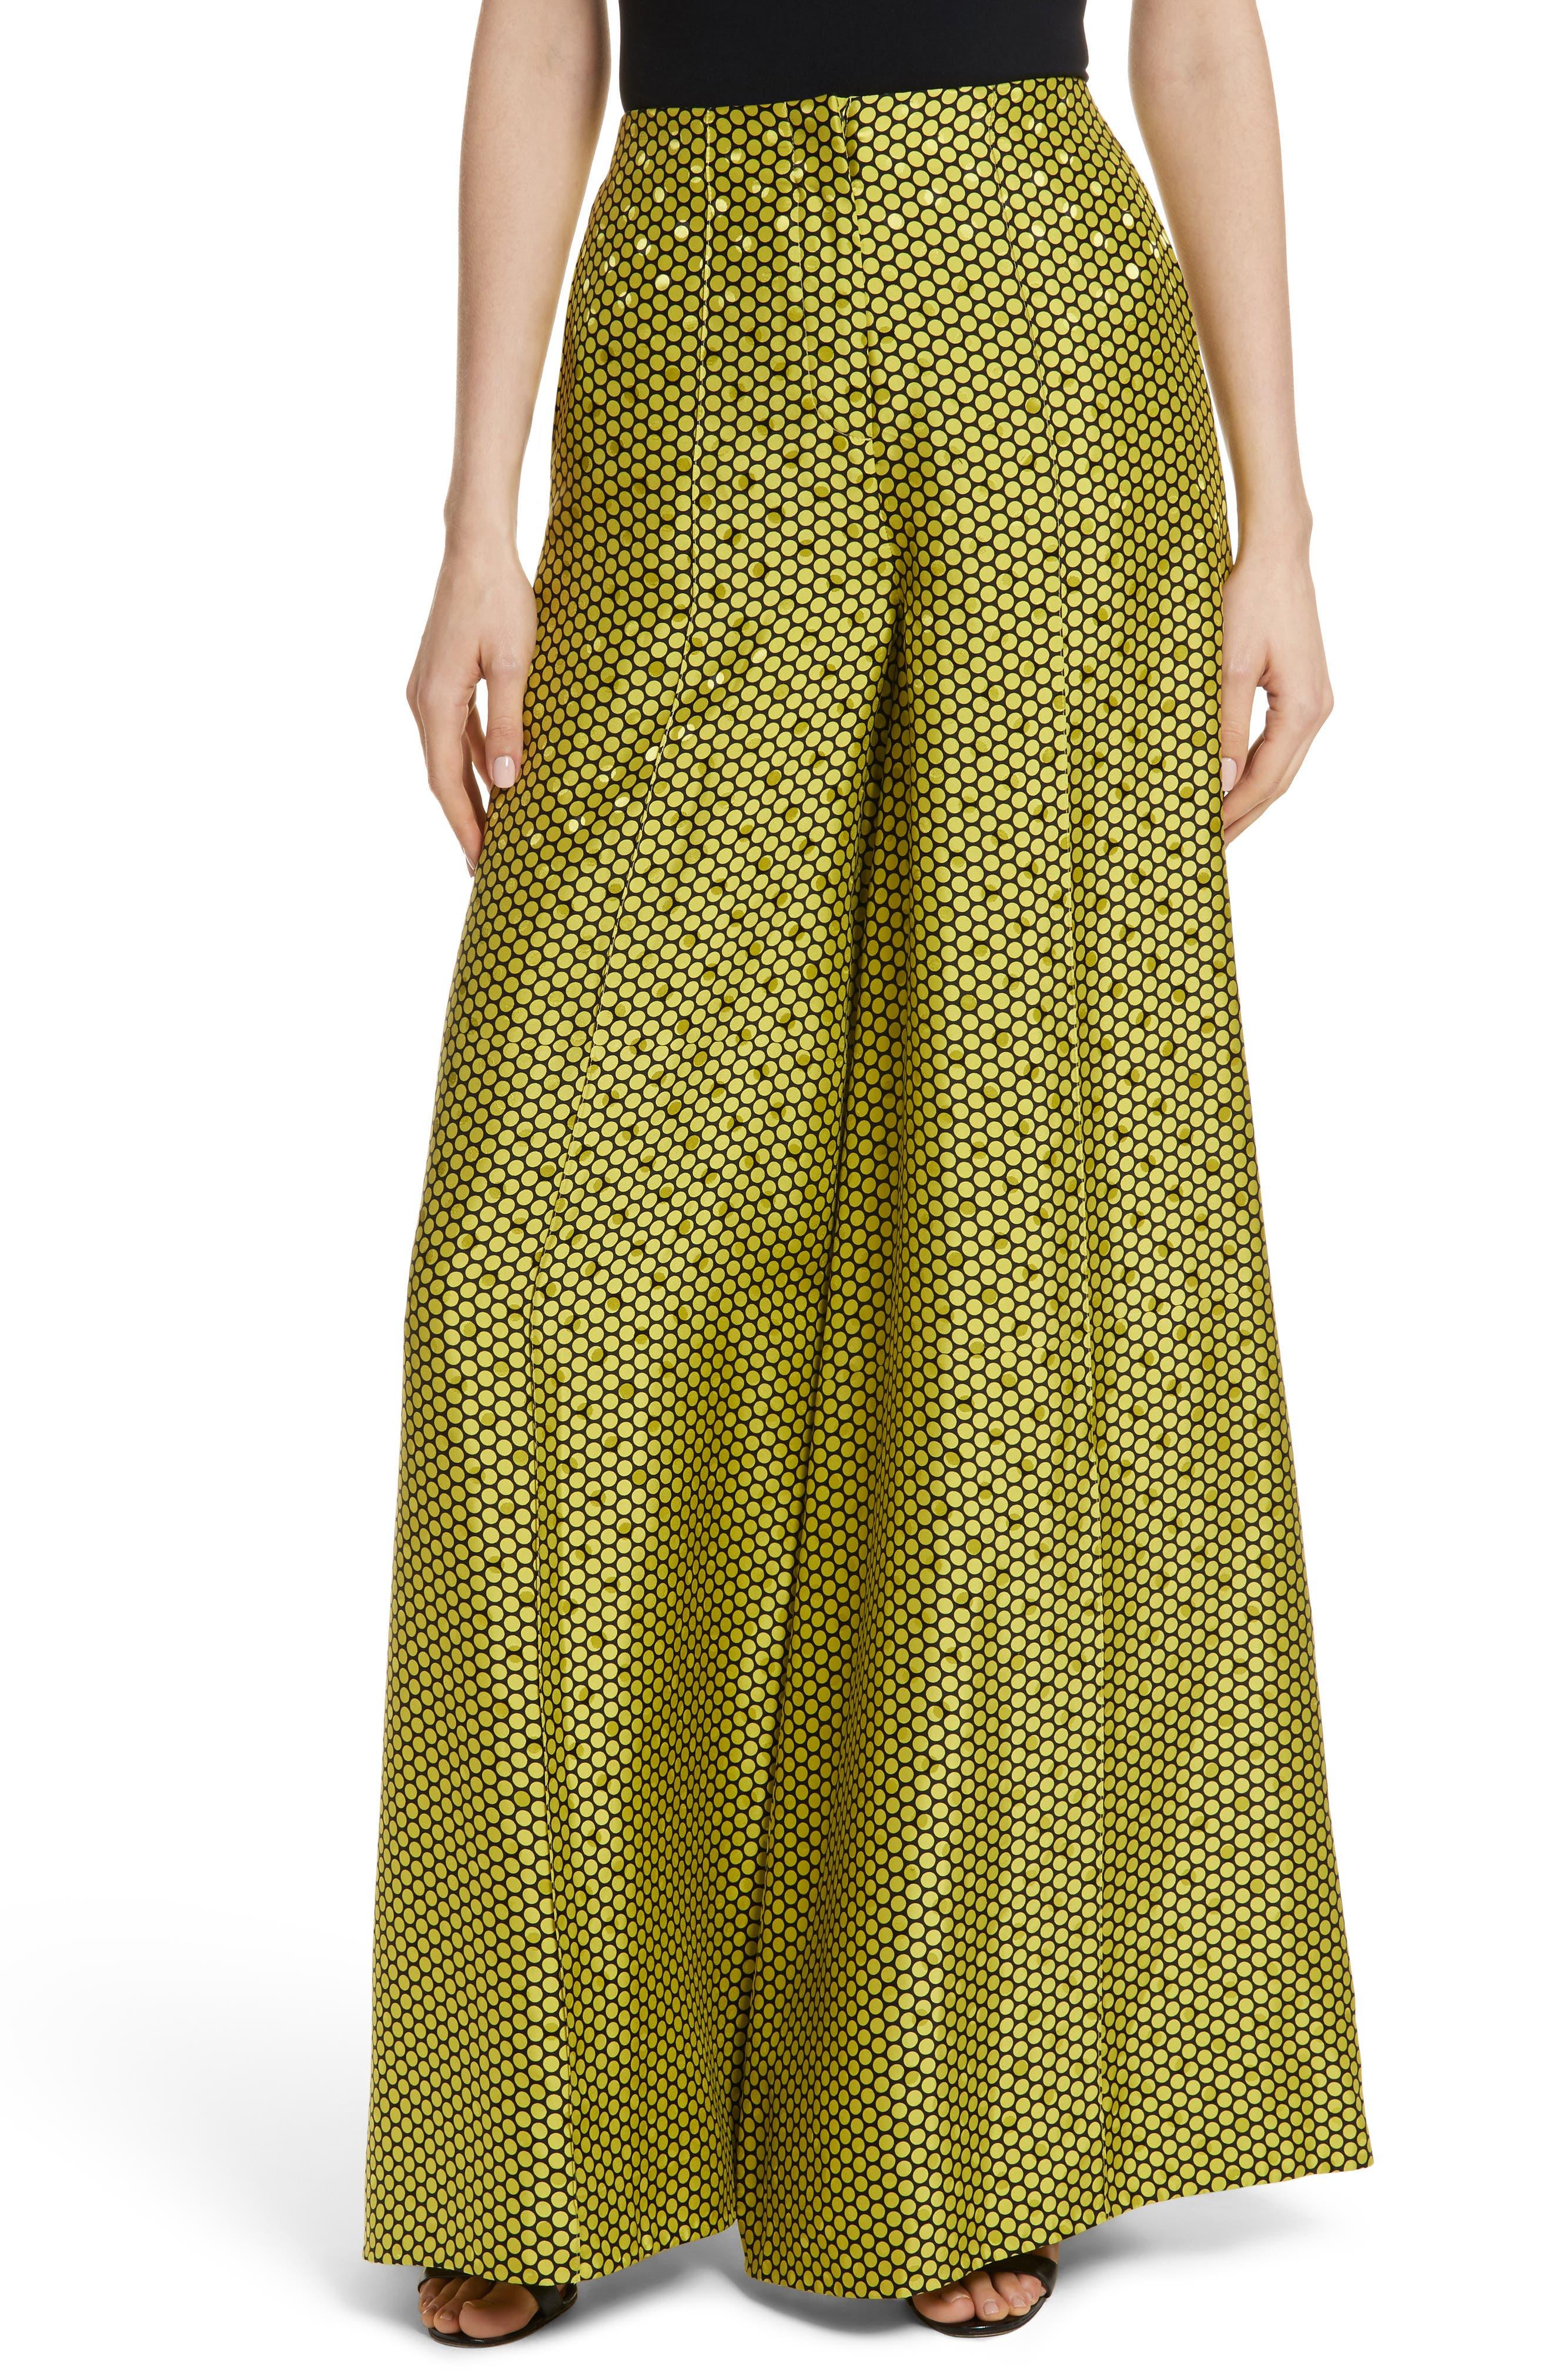 Diane von Furstenberg Dot Silk Palazzo Pants,                         Main,                         color, 390